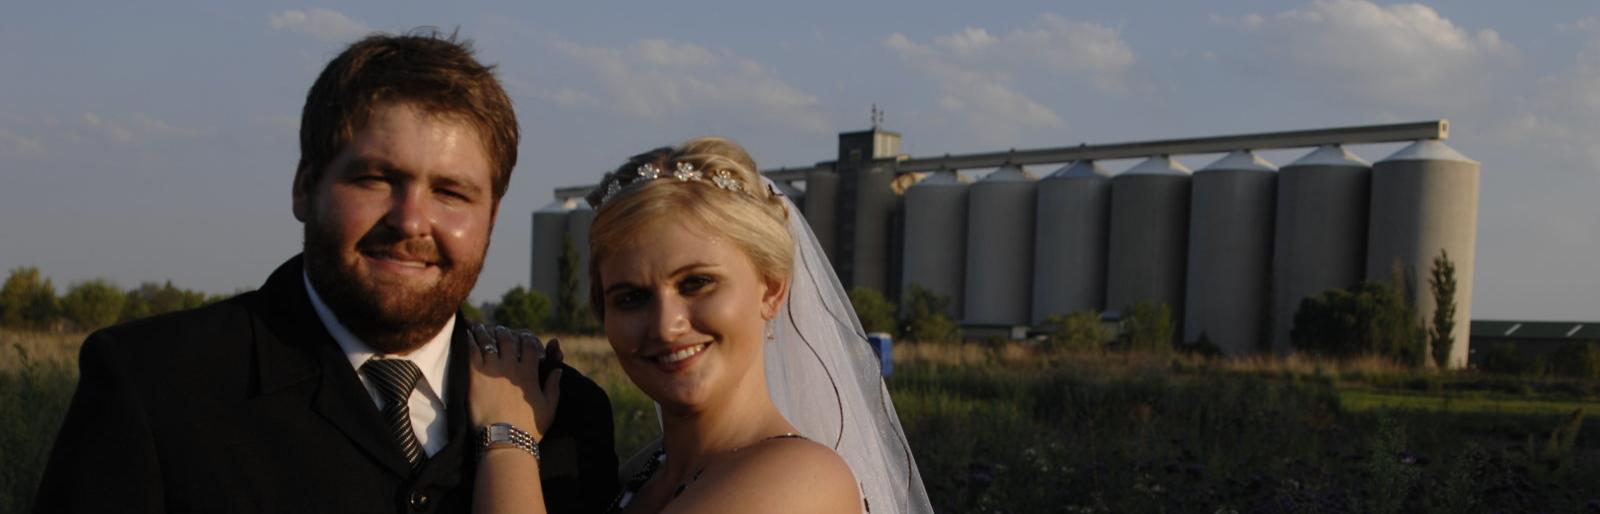 Chrisna Kleynhans